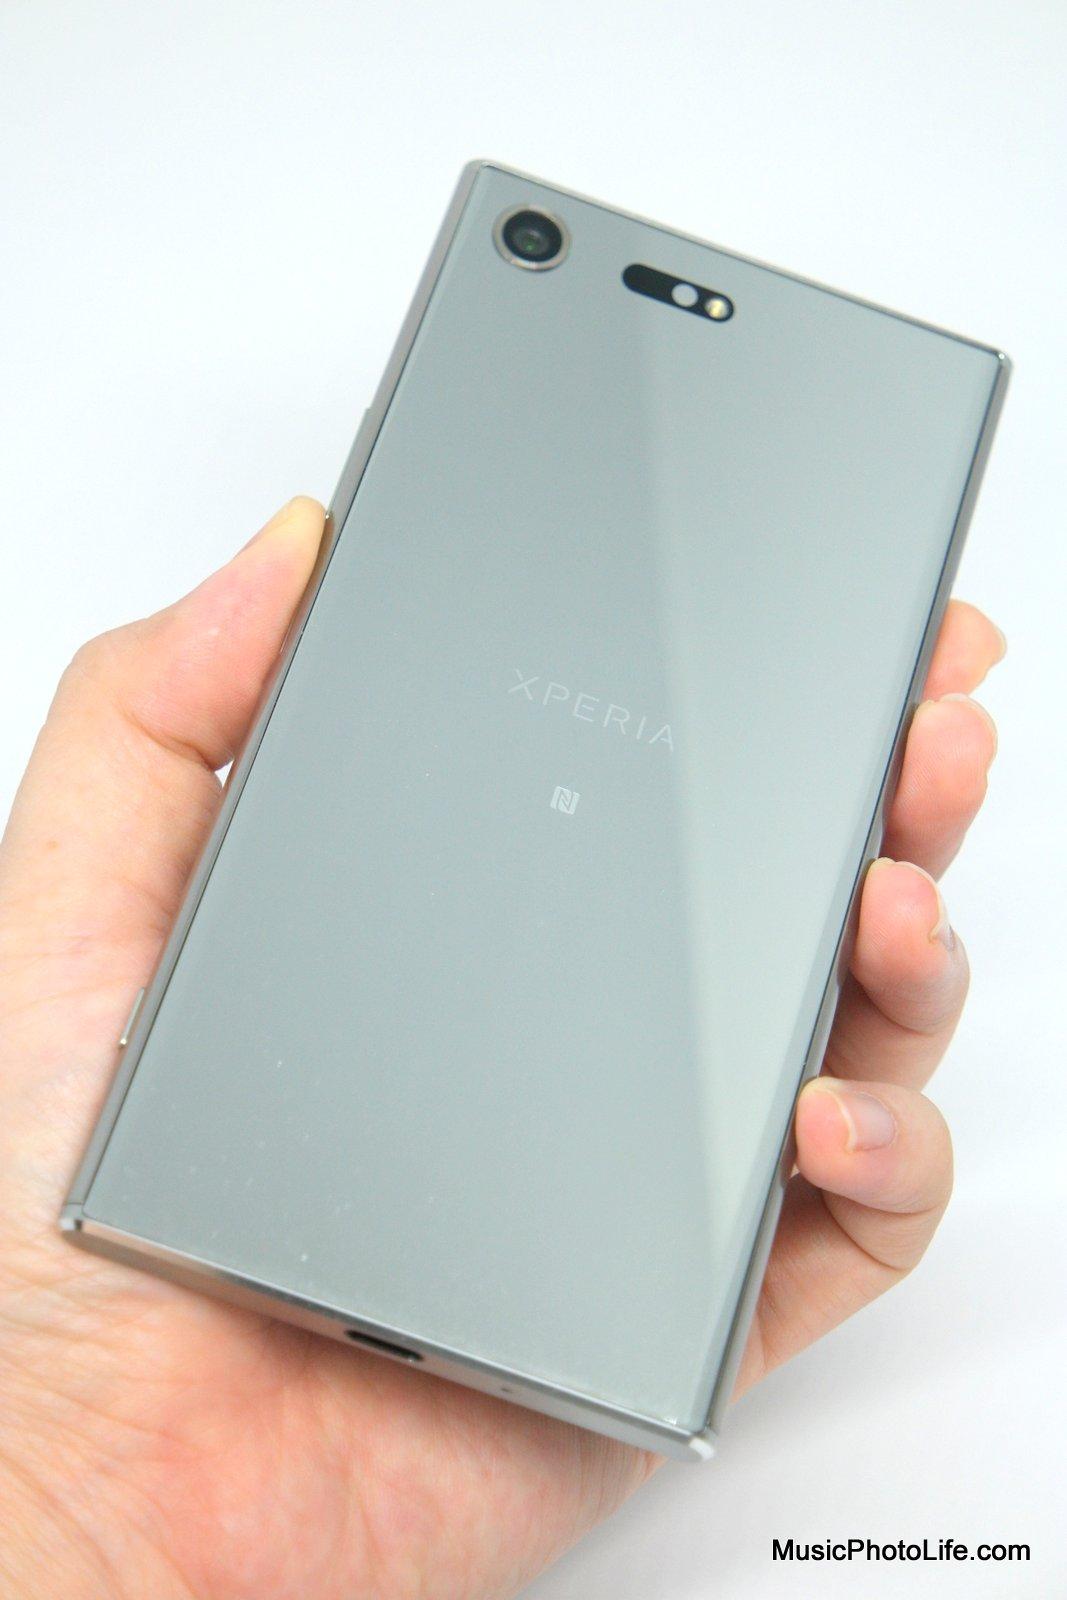 Sony Xperia XZ Premium shot on Whitebox Lightbox, review by musicphotolife.com